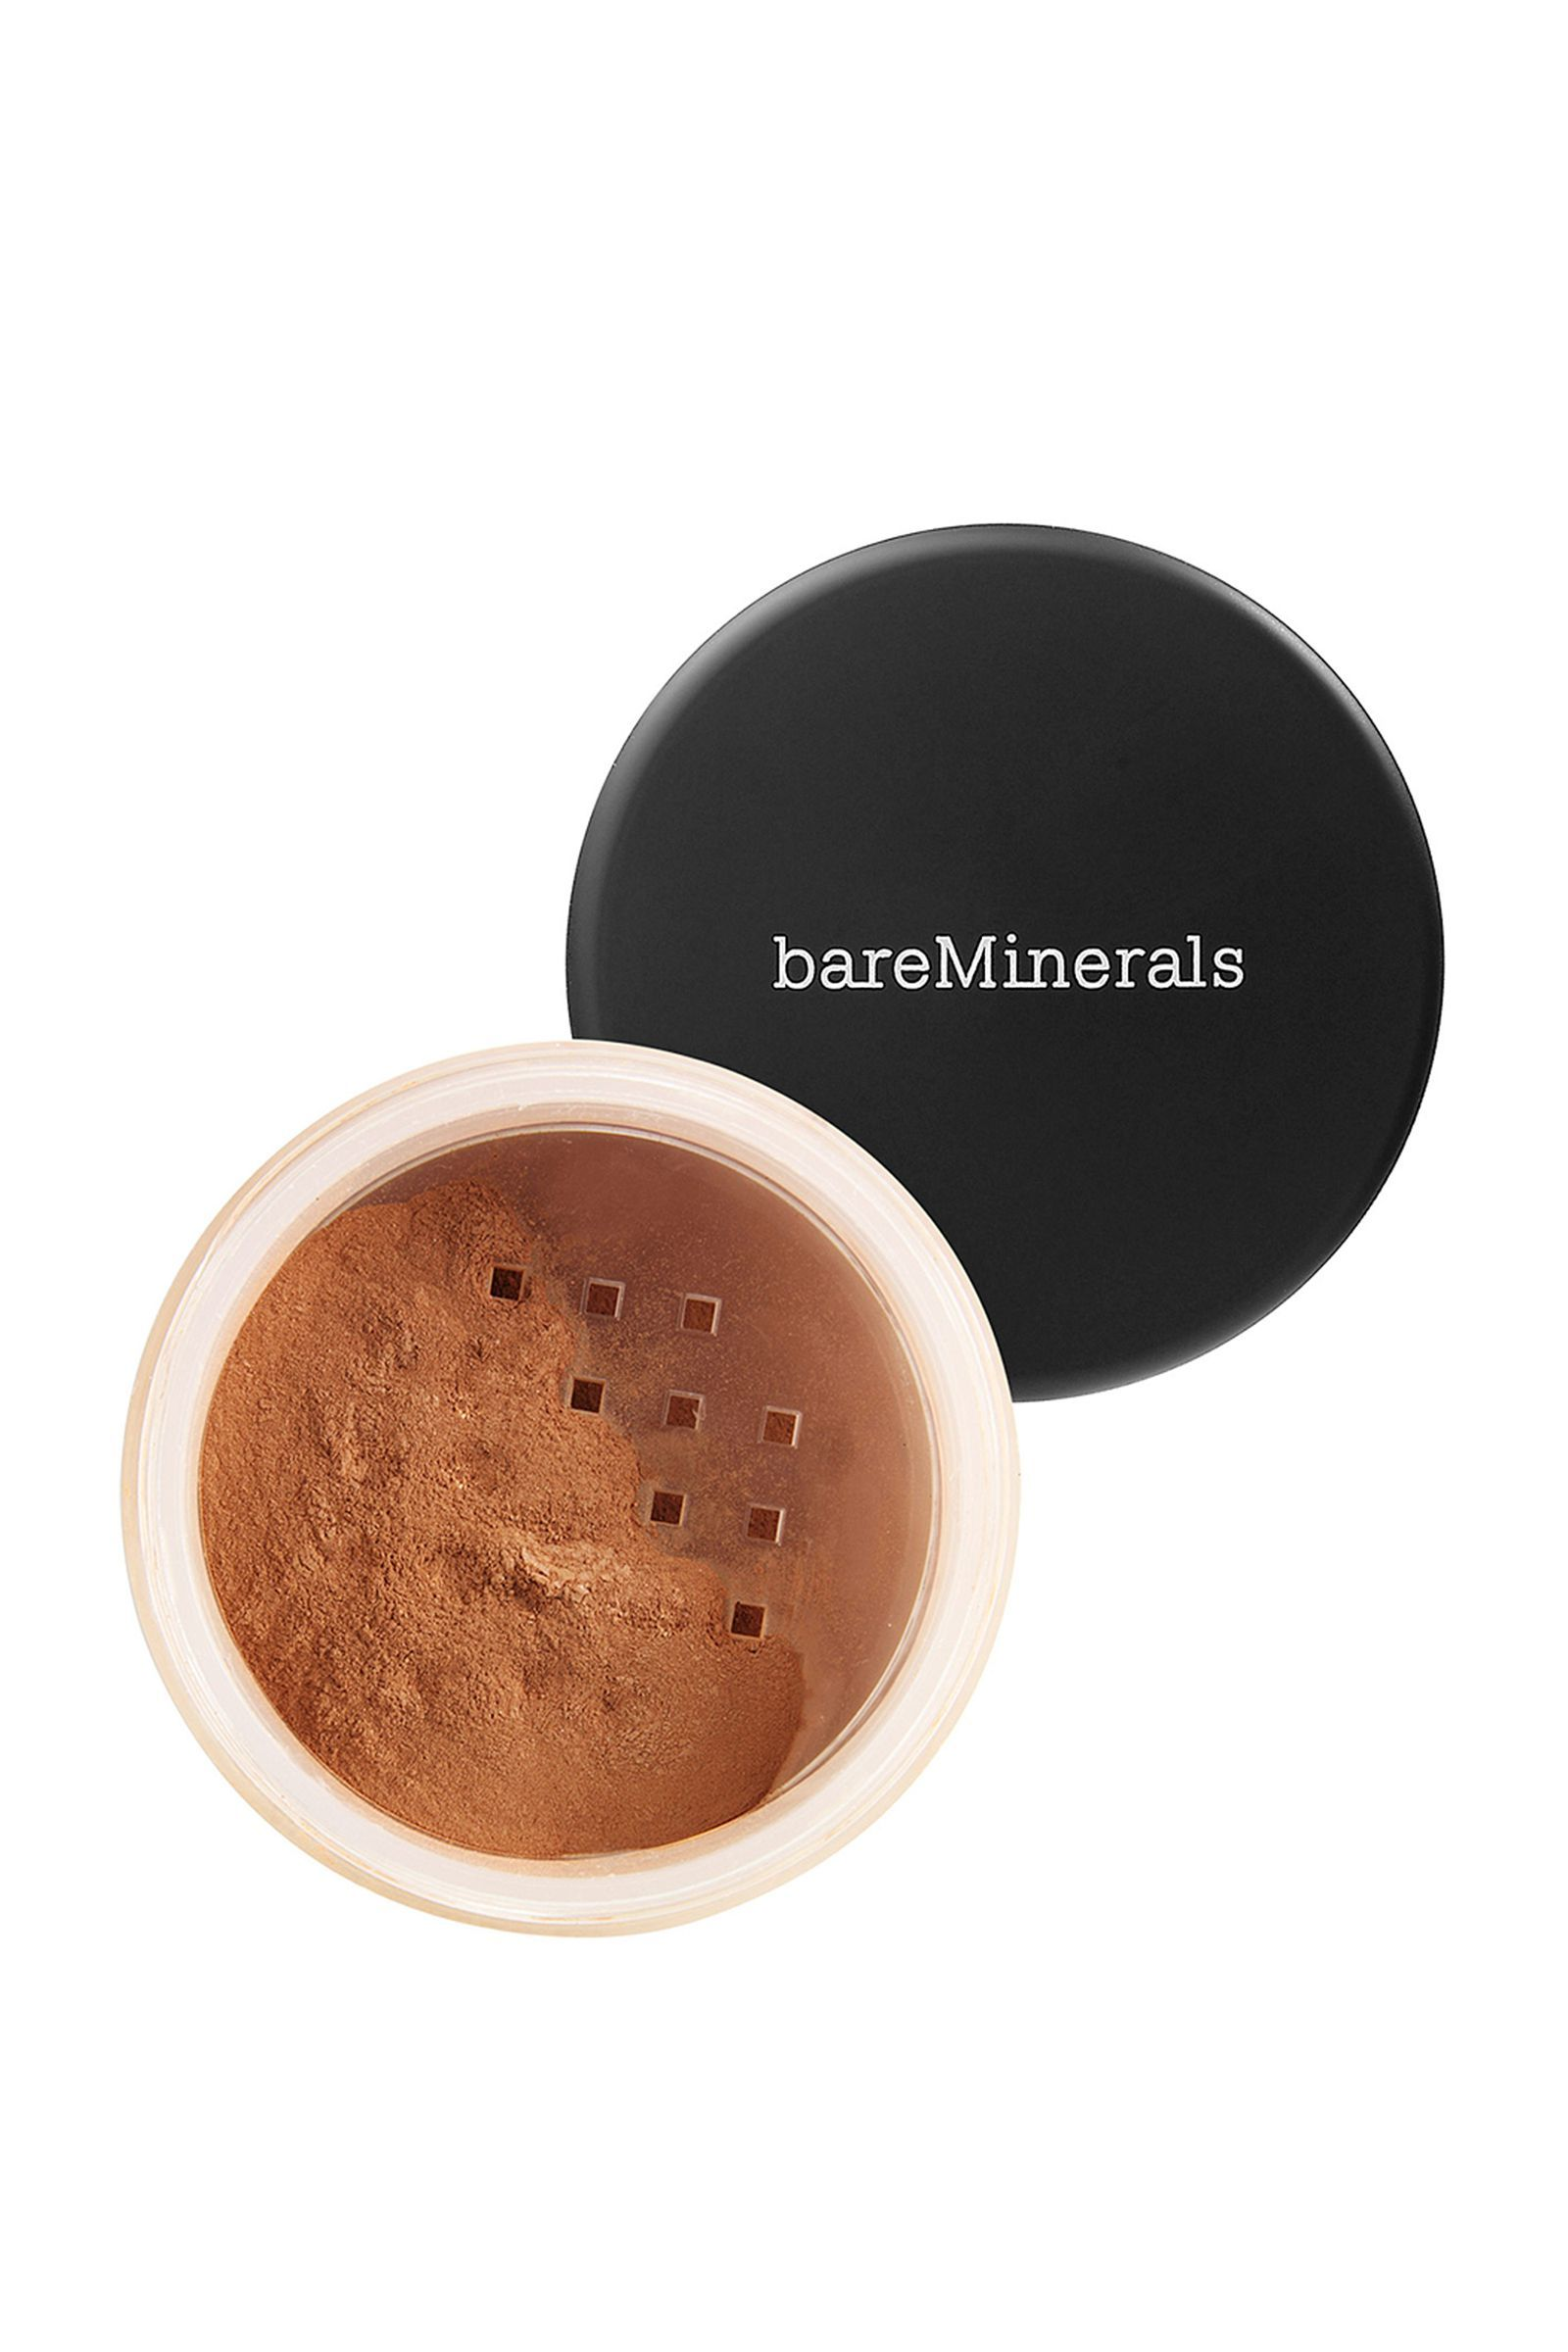 12 DermApproved, Makeup ArtistTested Mineral Foundations